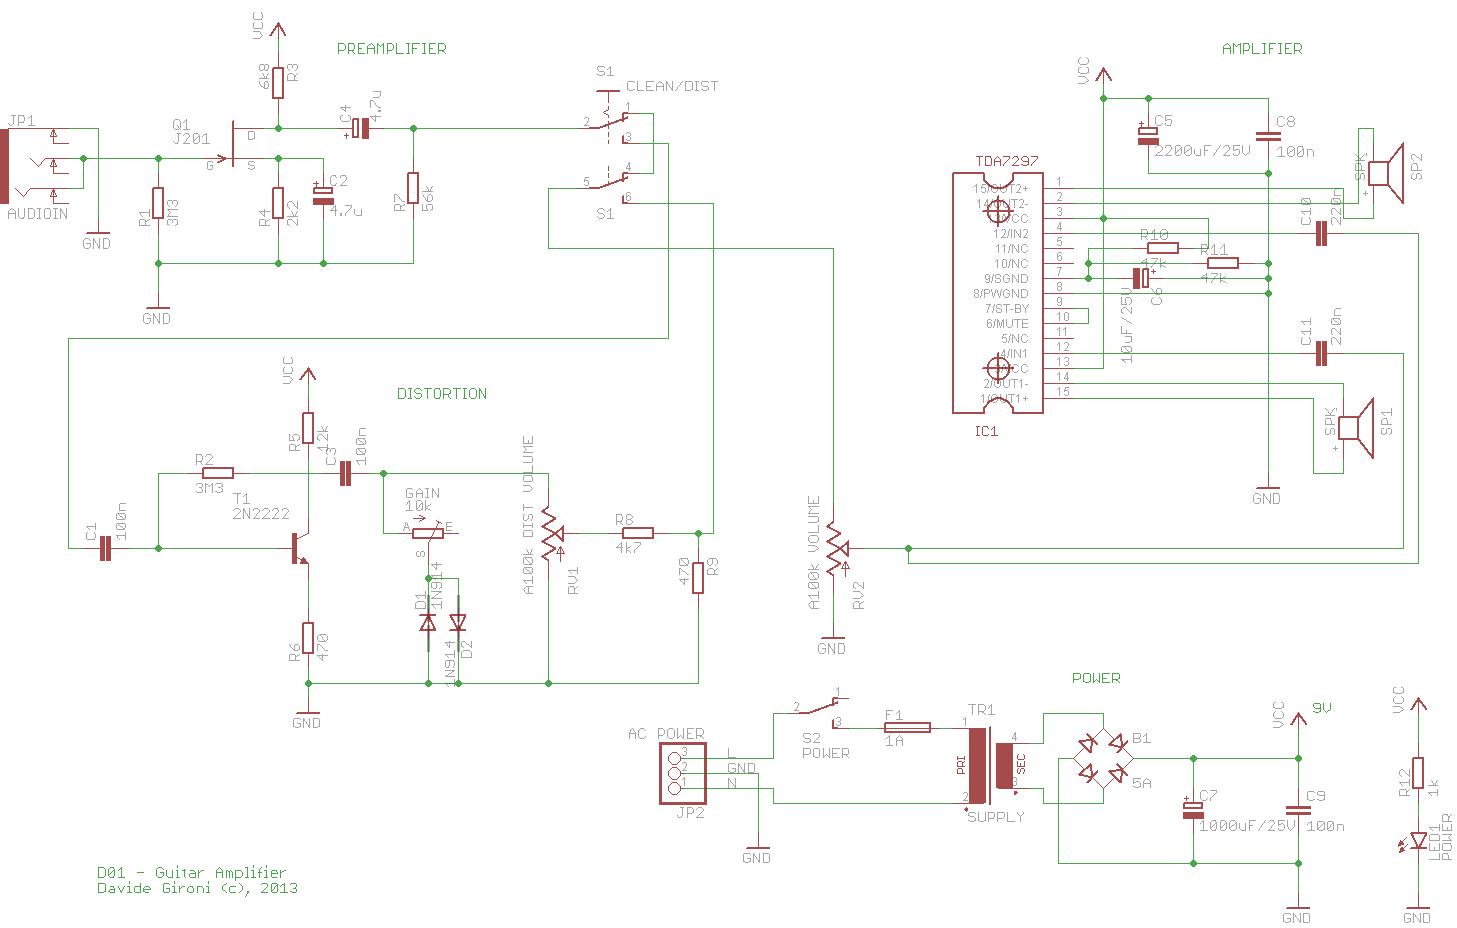 Davide Gironi: D01: 2*15W guitar amplifier built using